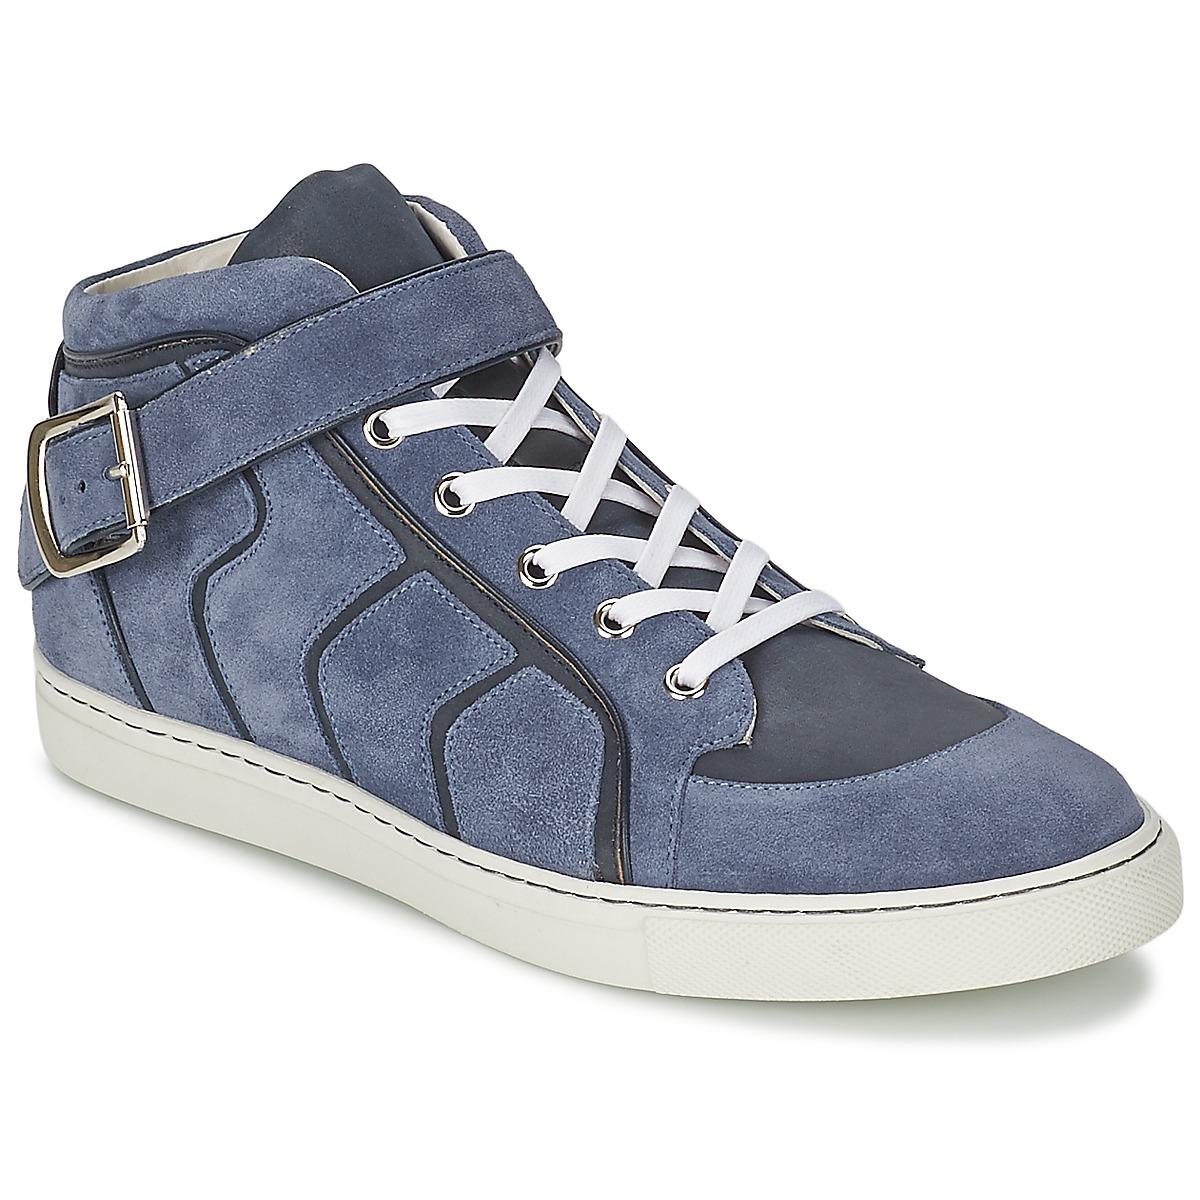 Basket montante Vivienne Westwood HIGH TRAINER Bleu